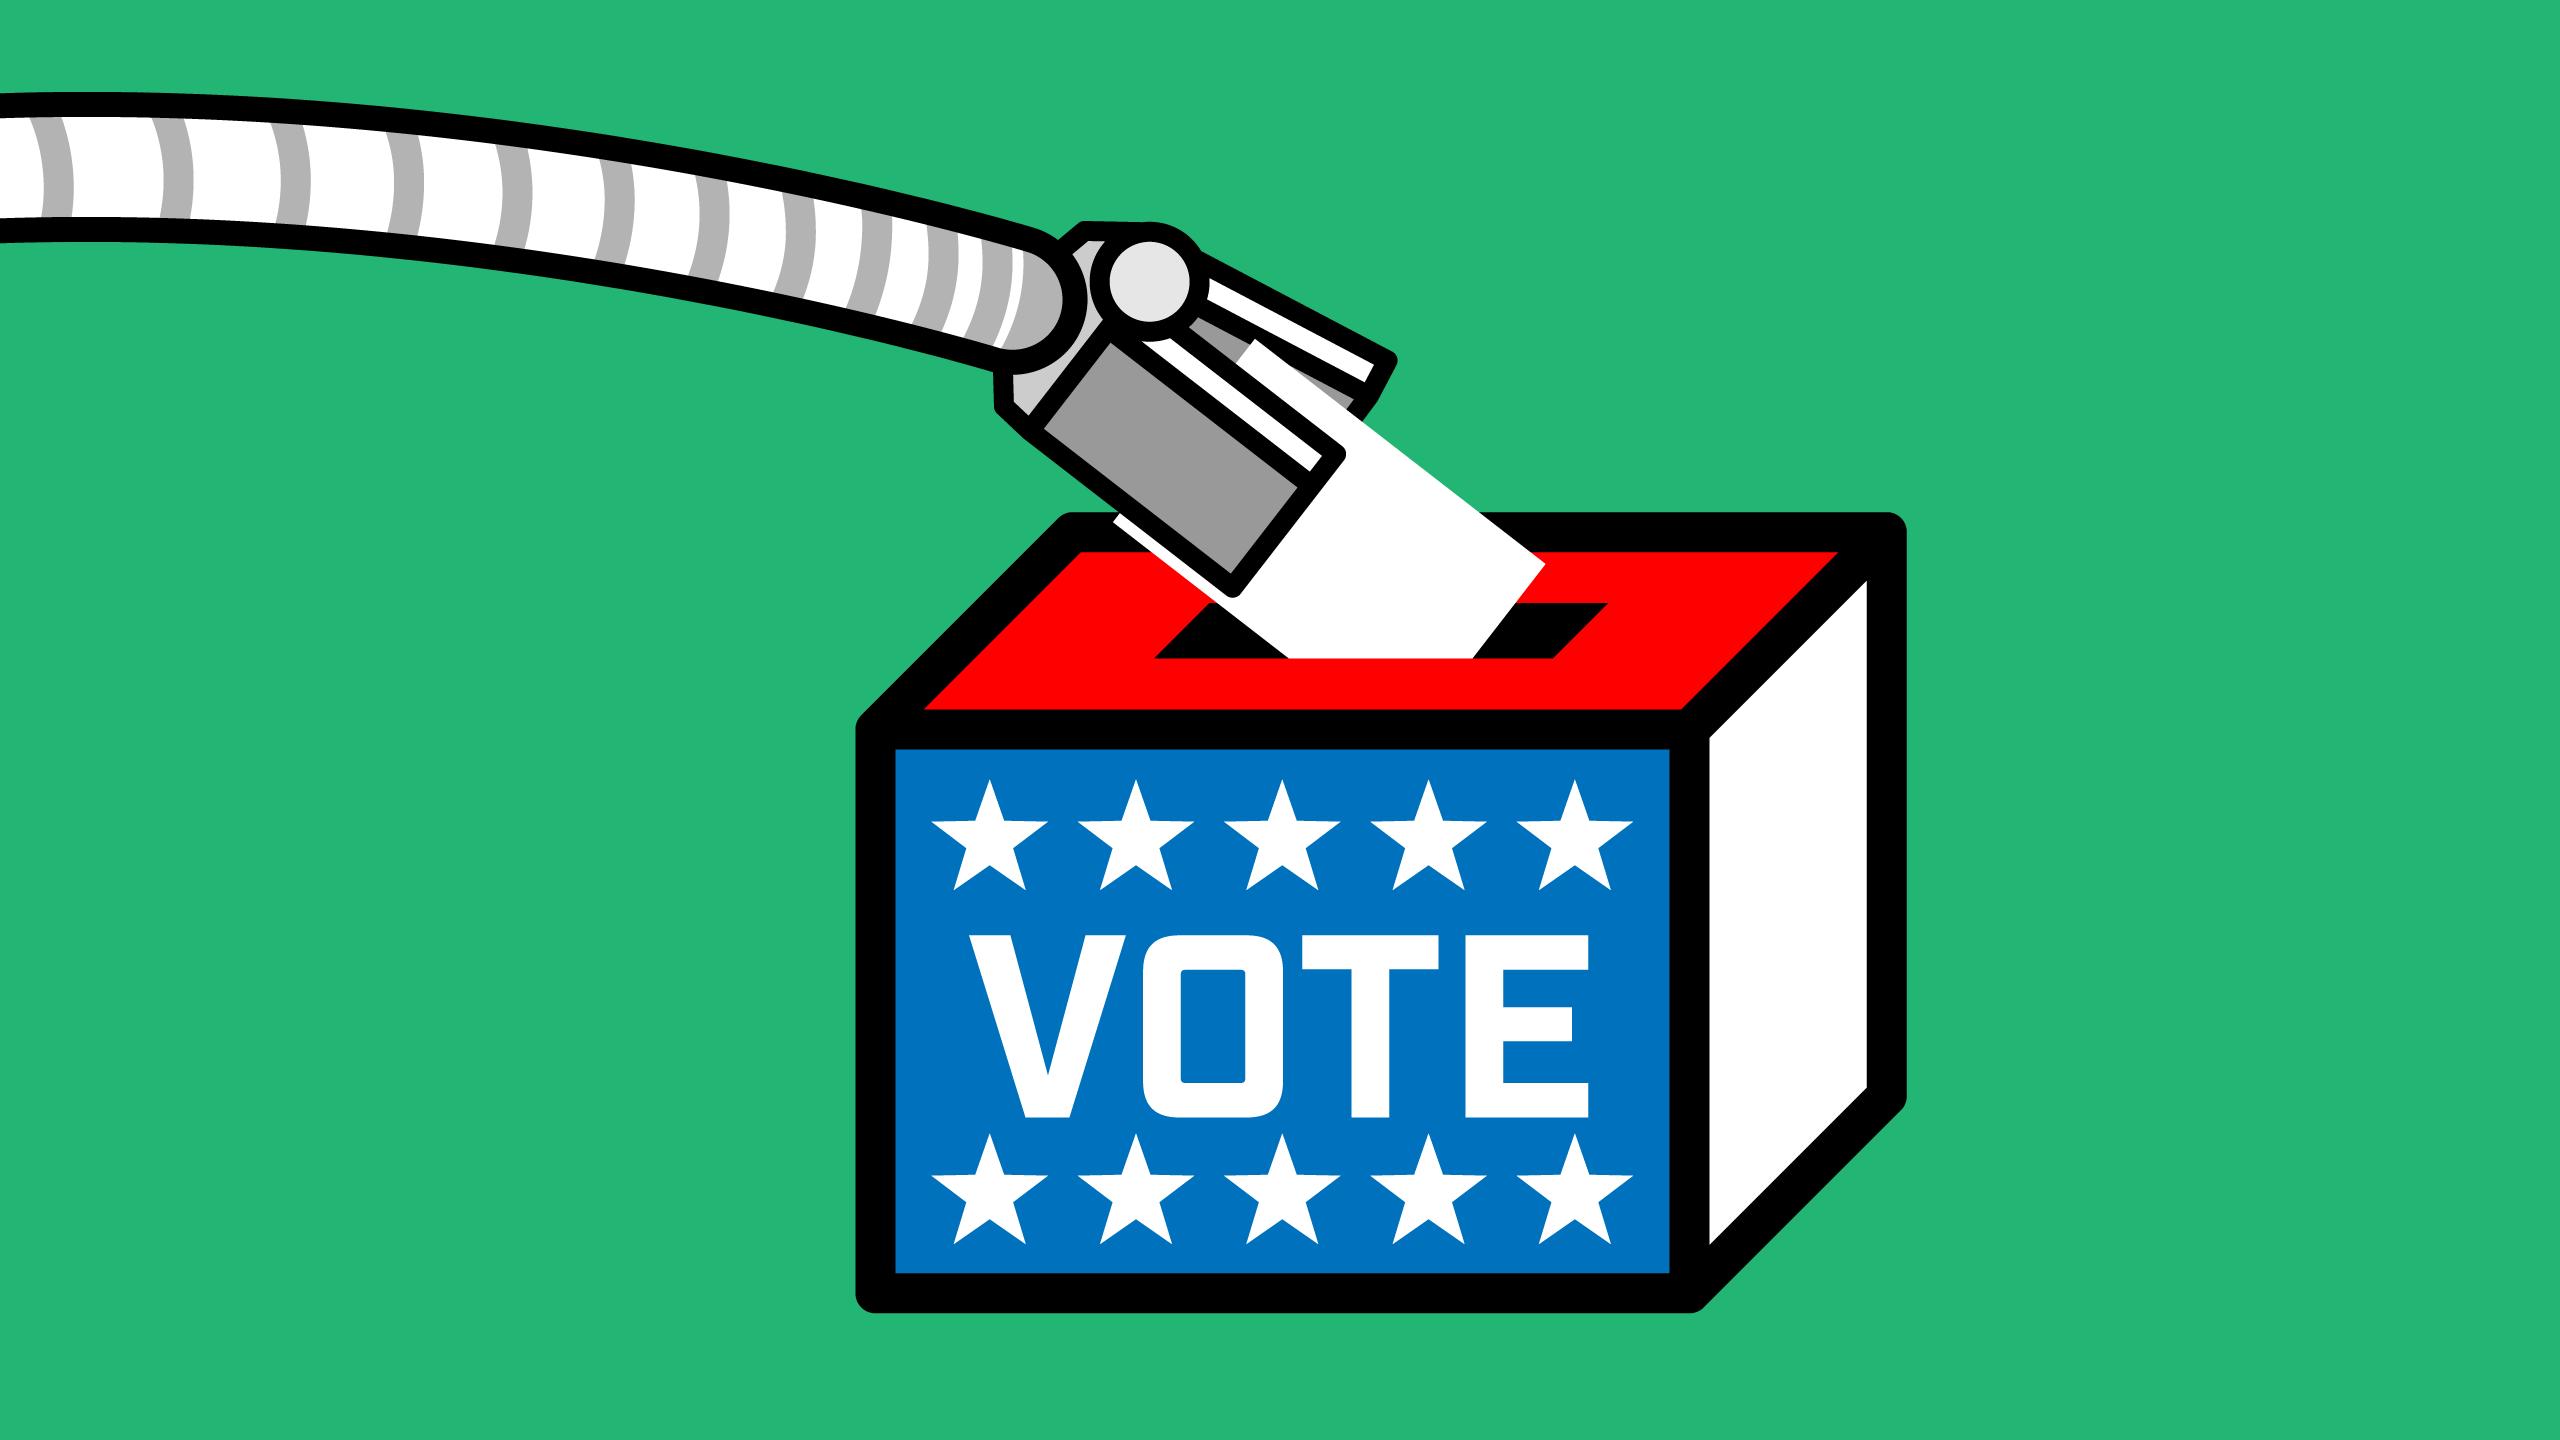 Rocky de la fuente clipart freeuse stock Jill Stein campaign files to recount votes in Wisconsin ... freeuse stock